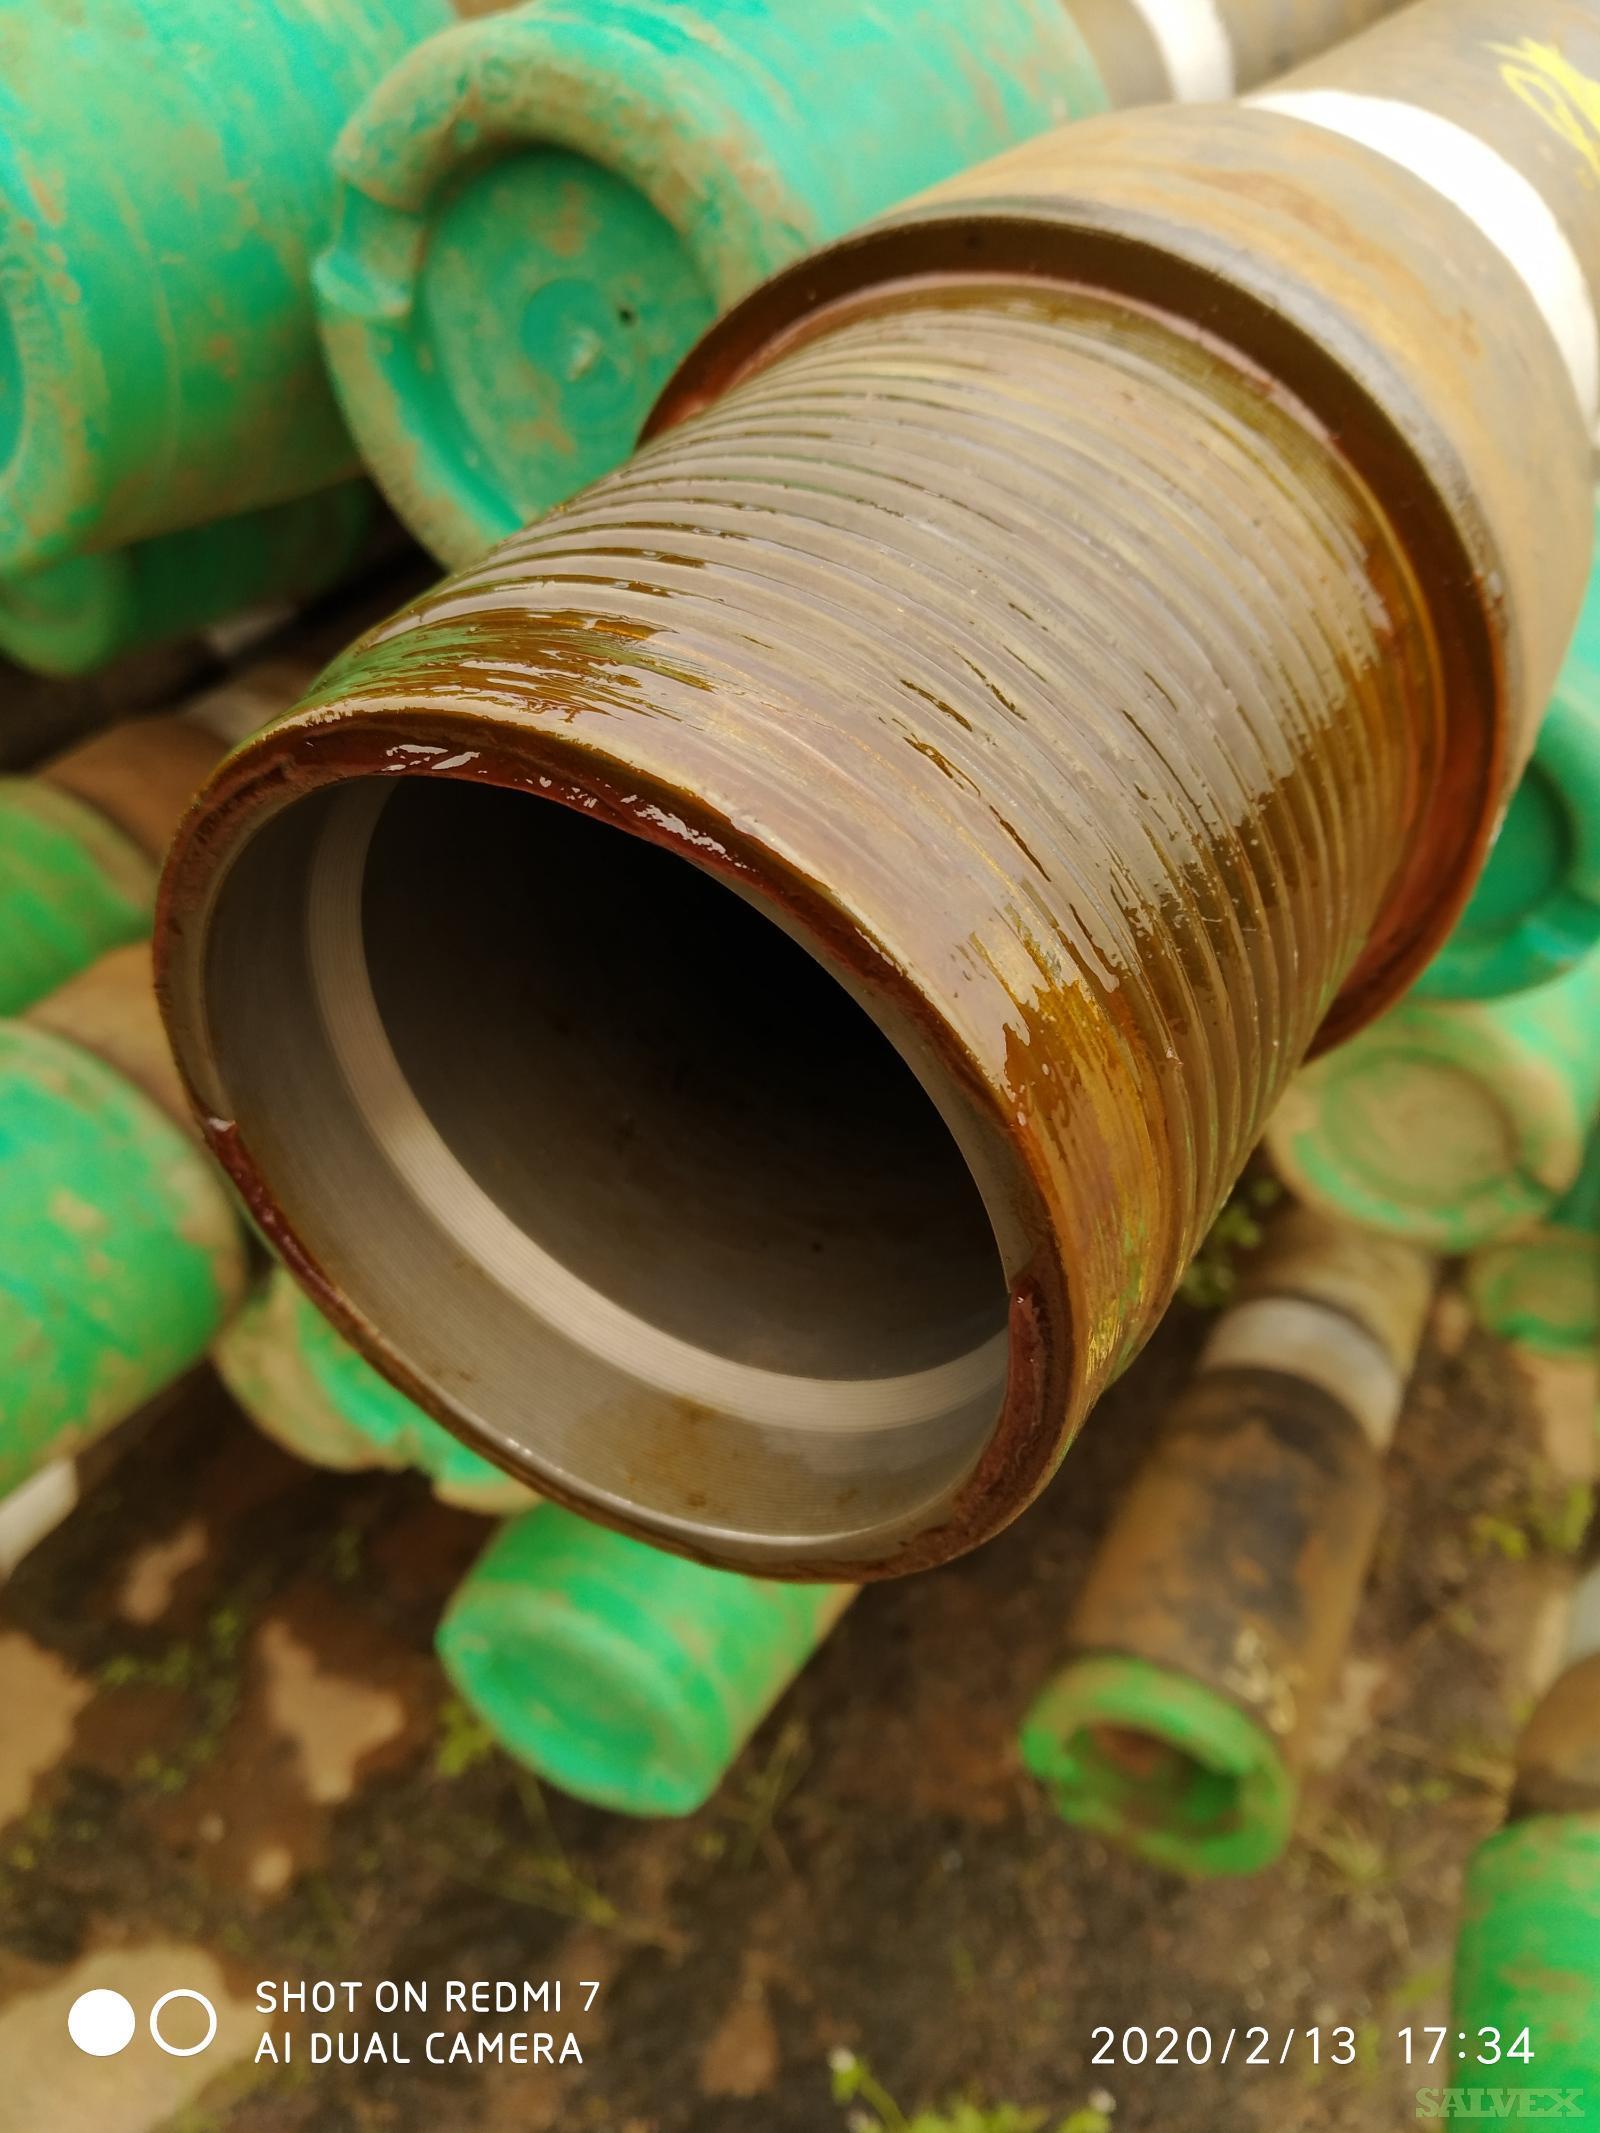 3 1/2 12.95# P110 ADMS R2 Surplus Tubing (24,556 Feet / 144 Metric Tons)